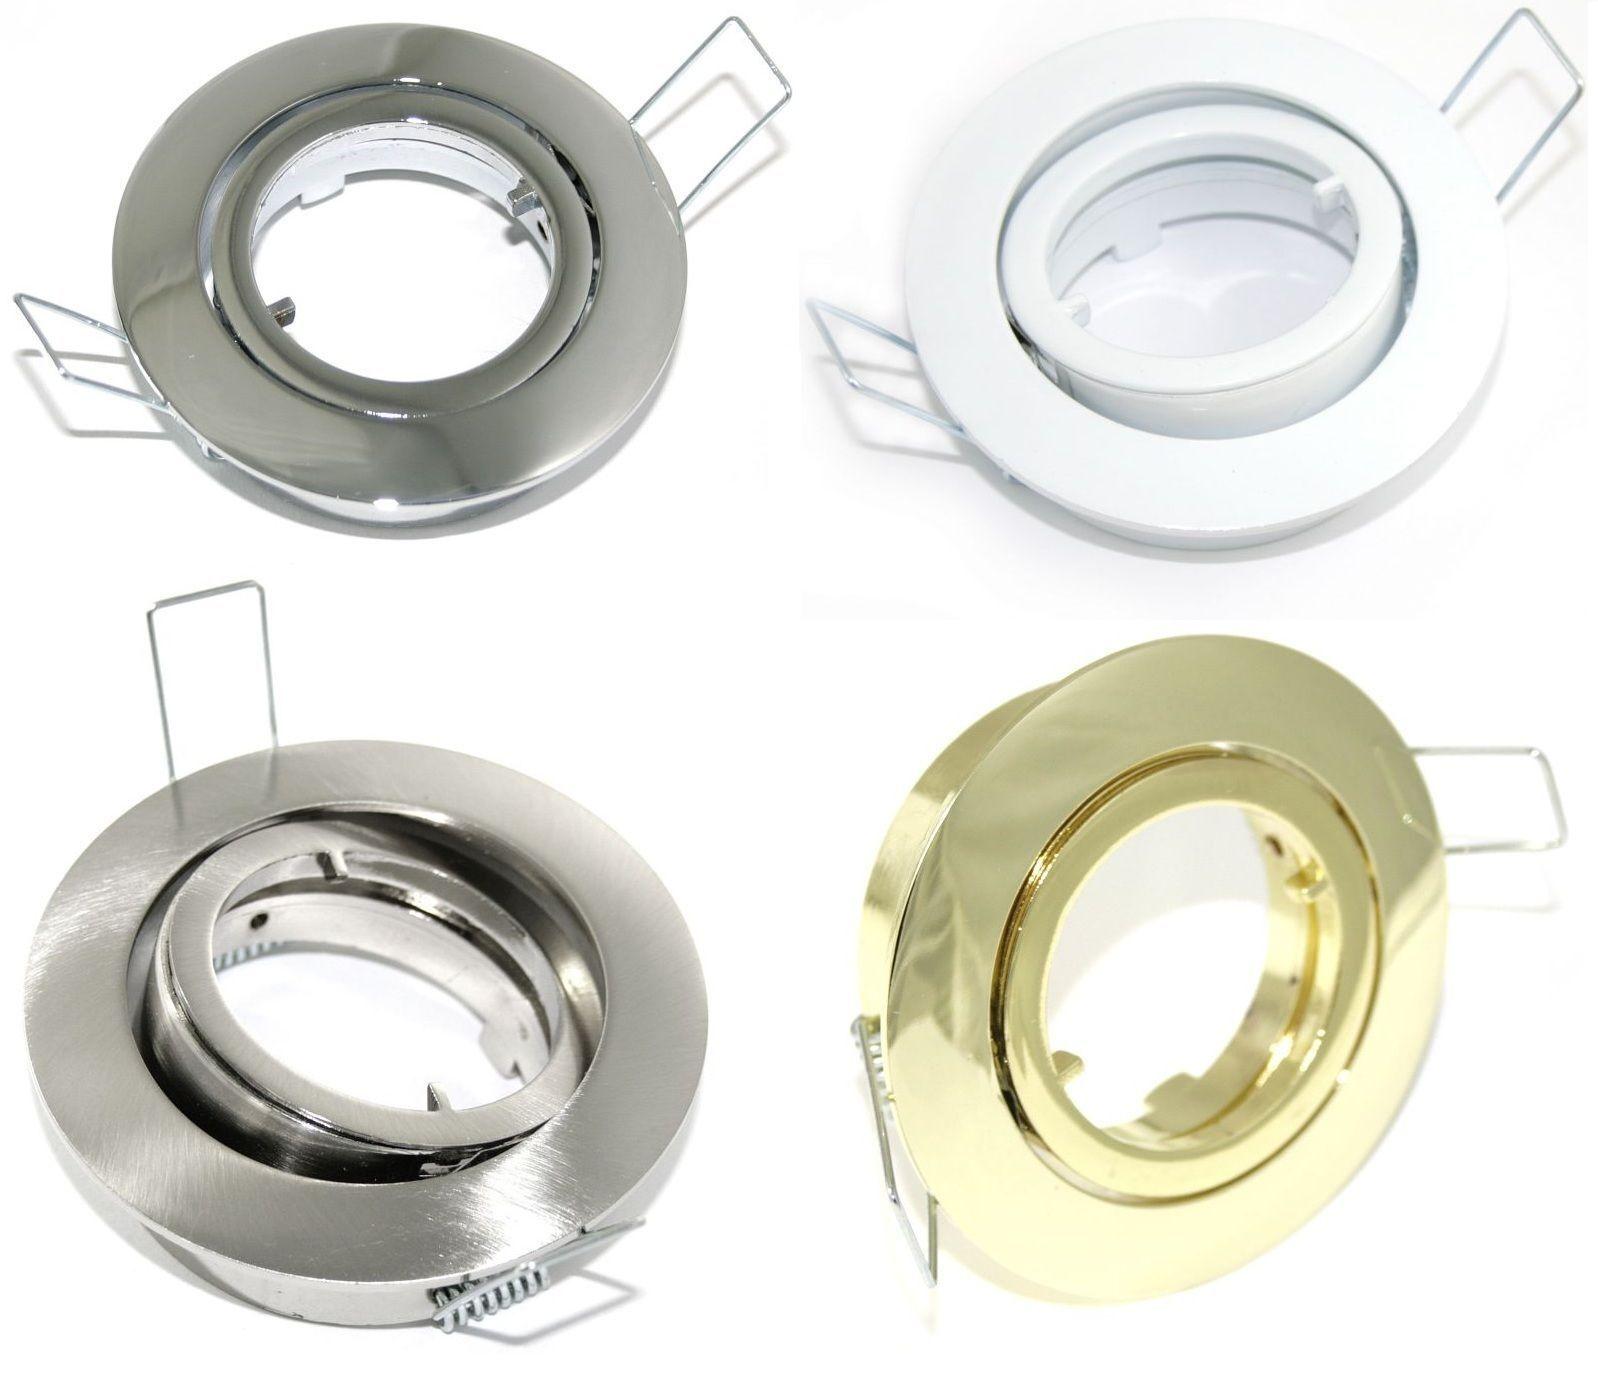 12V Einbaustrahler Bajo ohne Leuchtmittel   New Style    Vielfalt    Mangelware